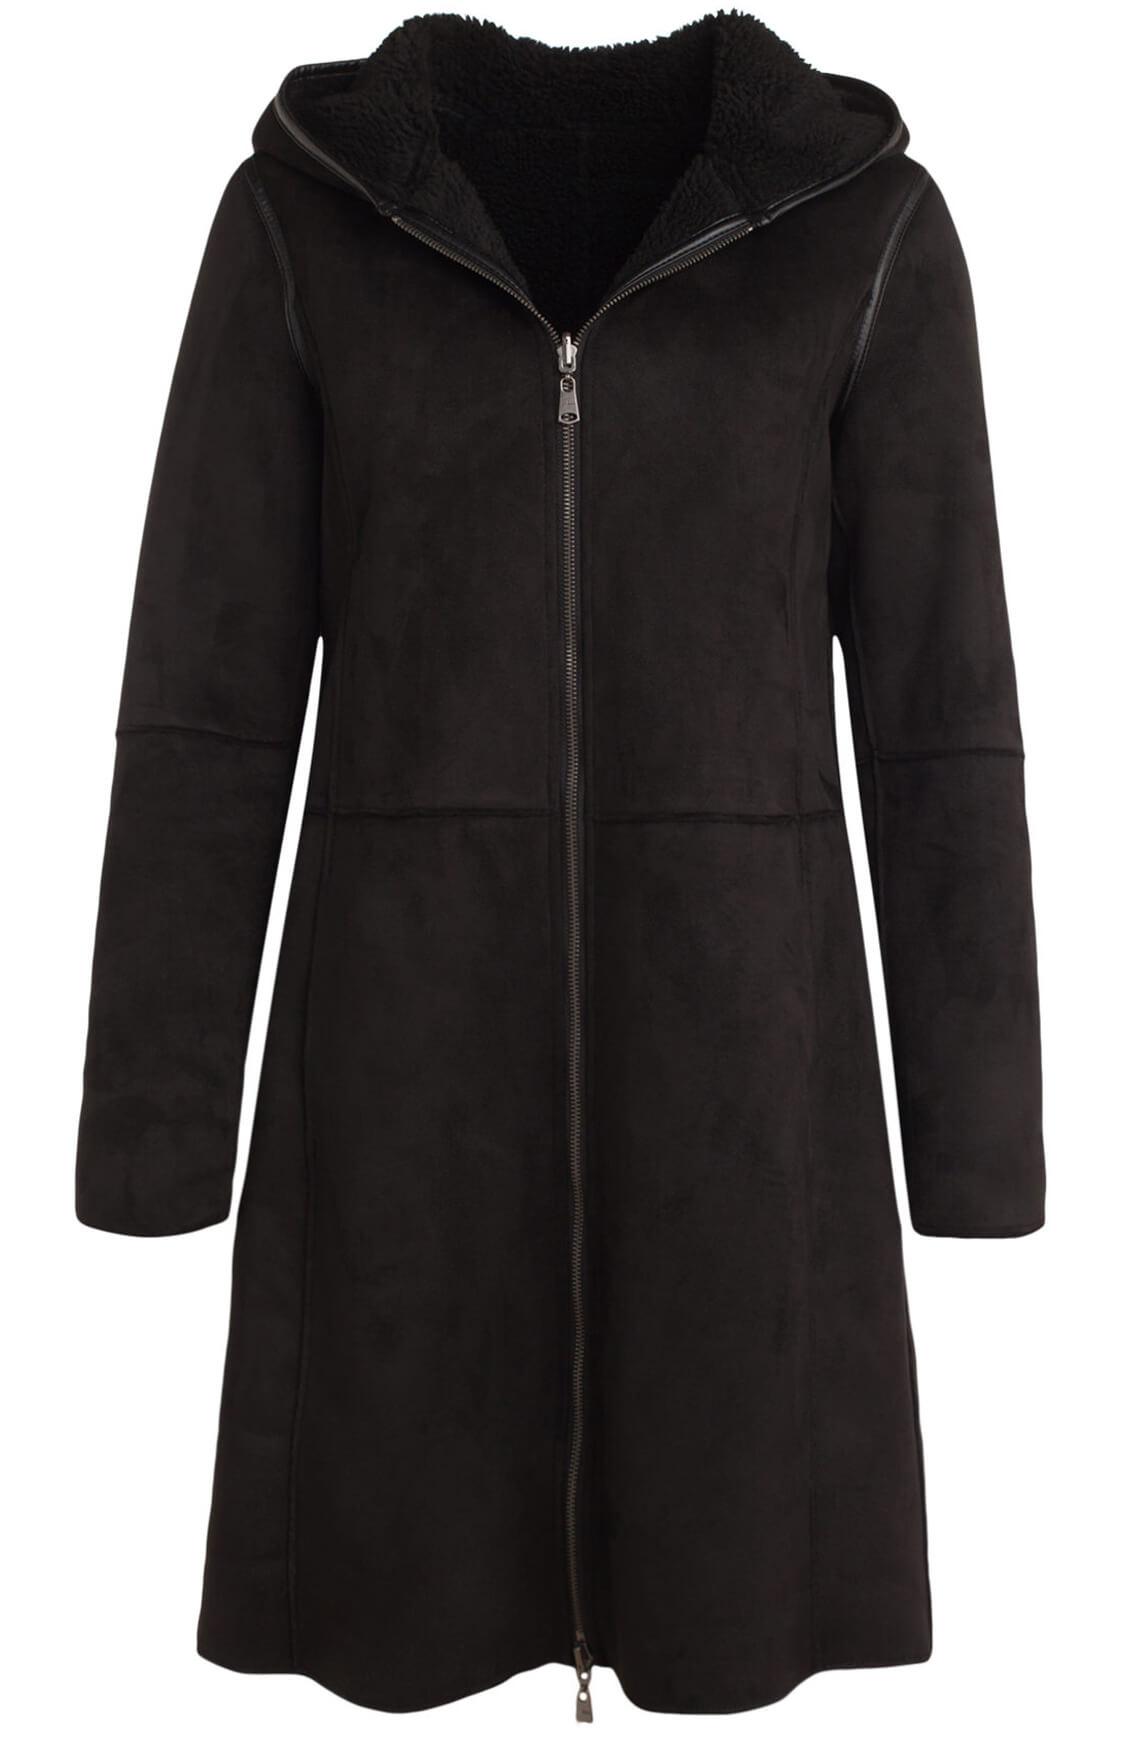 Beaumont Dames Reversible lammy jas zwart